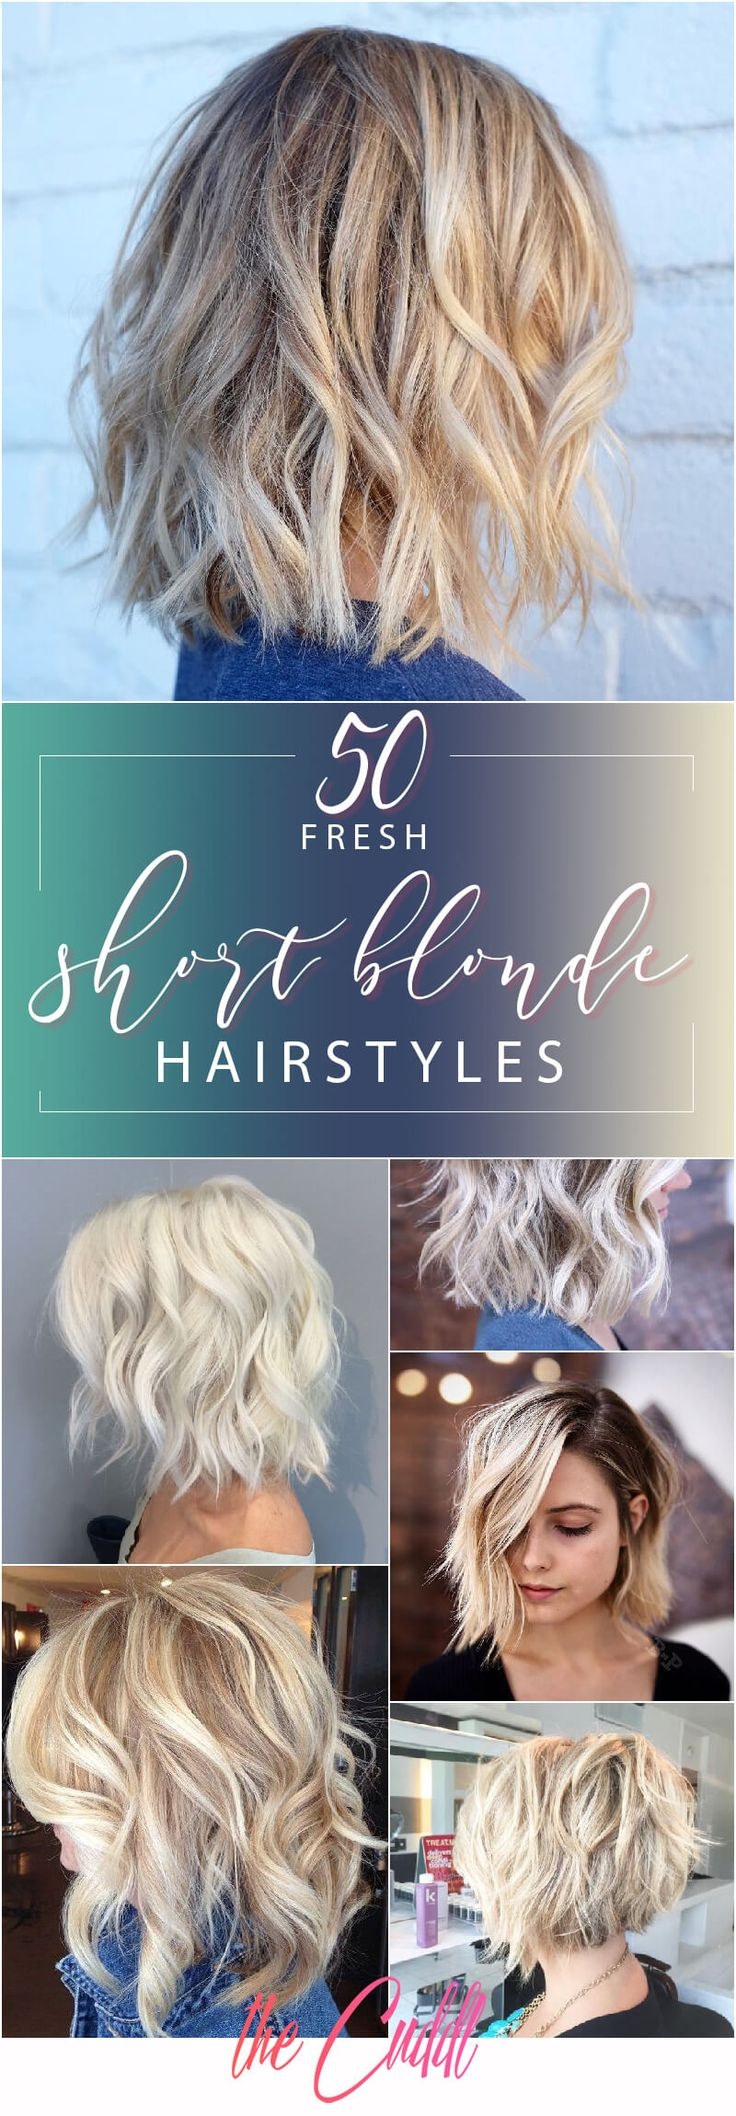 hair styles drawing ideas